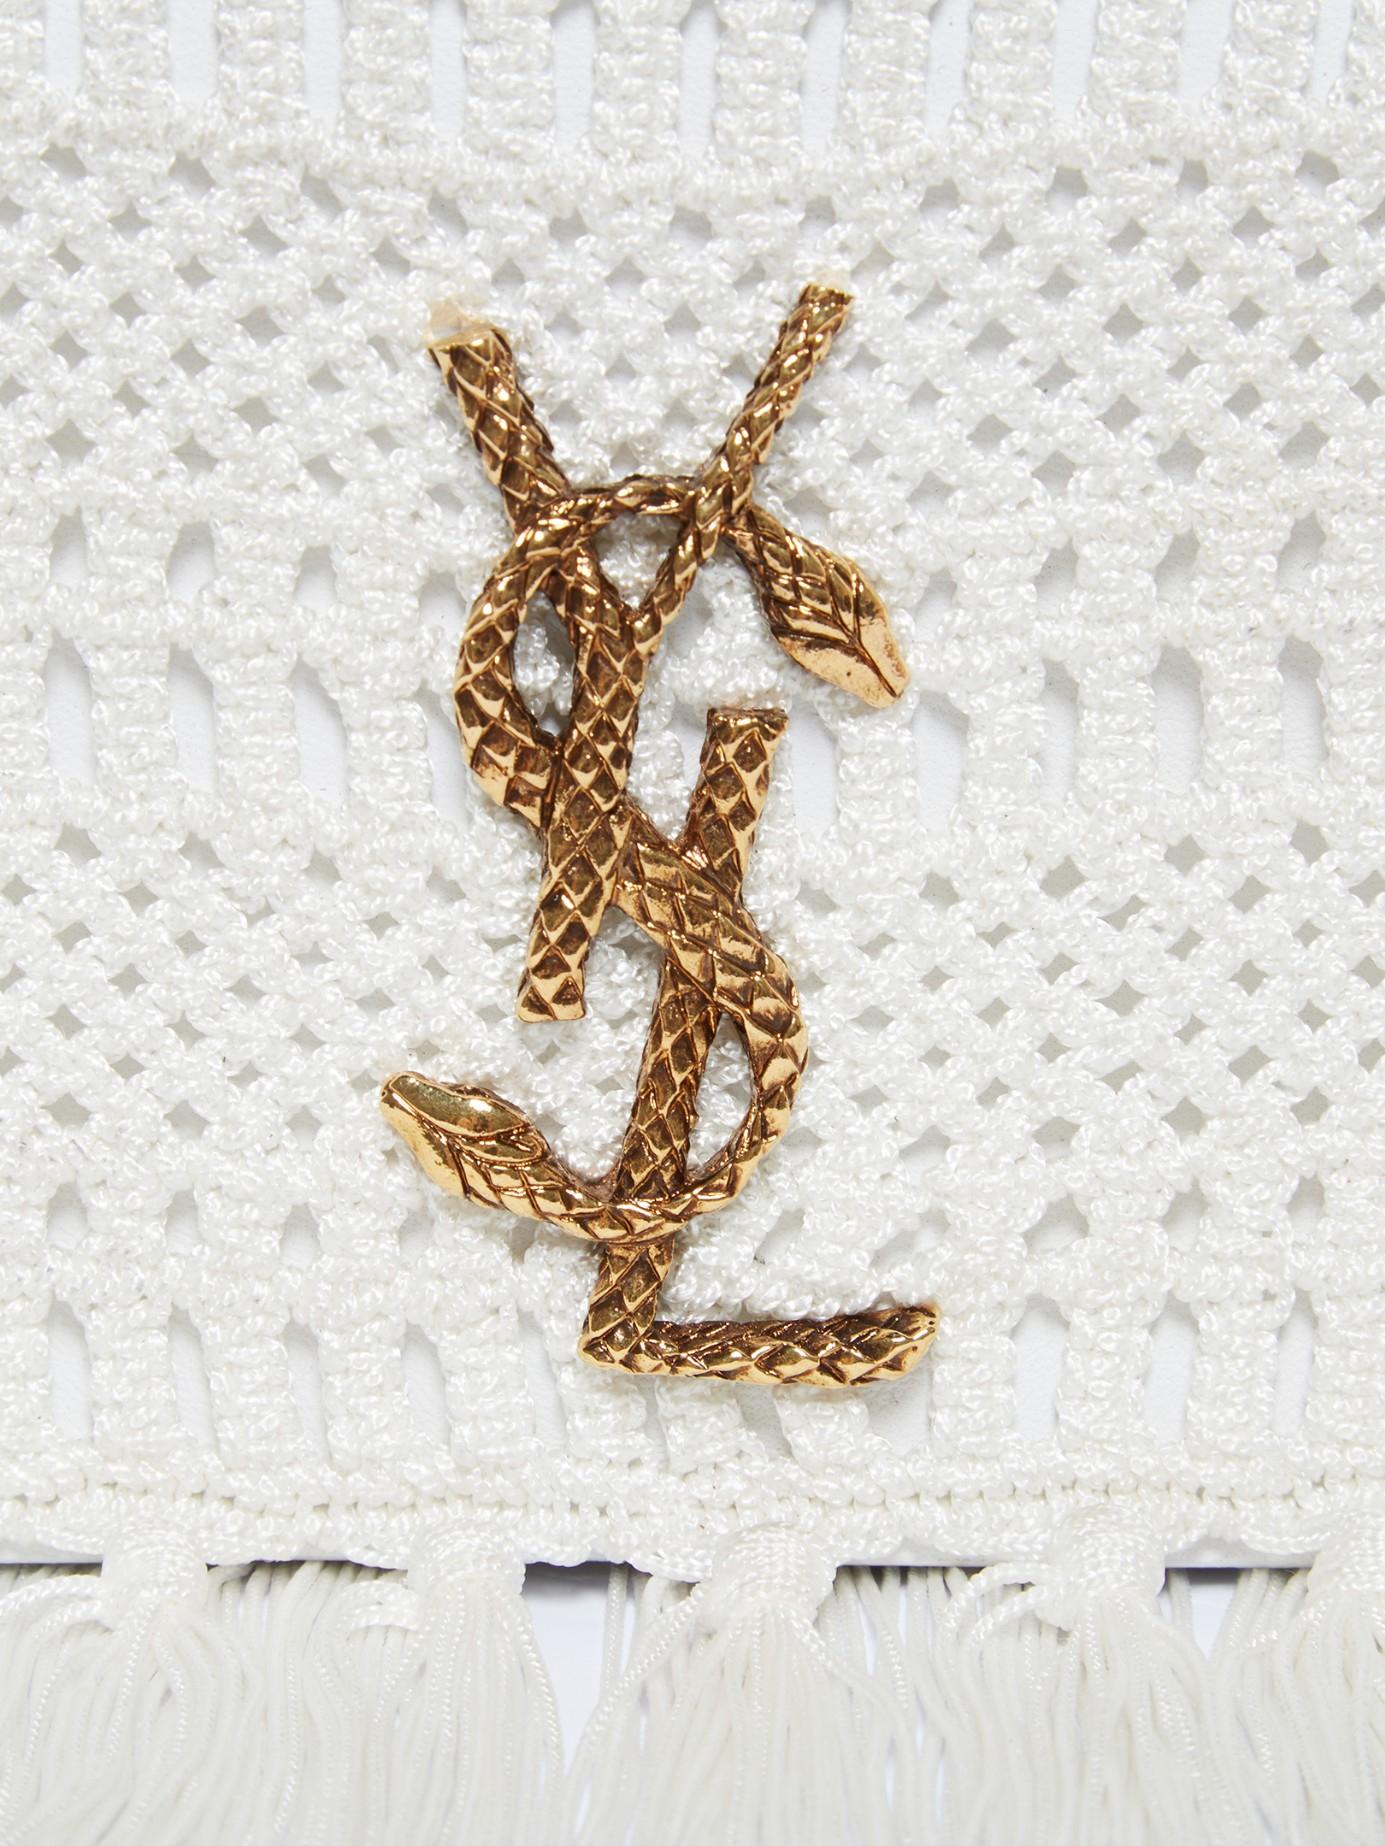 Lyst - Saint Laurent Monogram Serpent-logo Crochet Clutch in White 49daca5eb337c